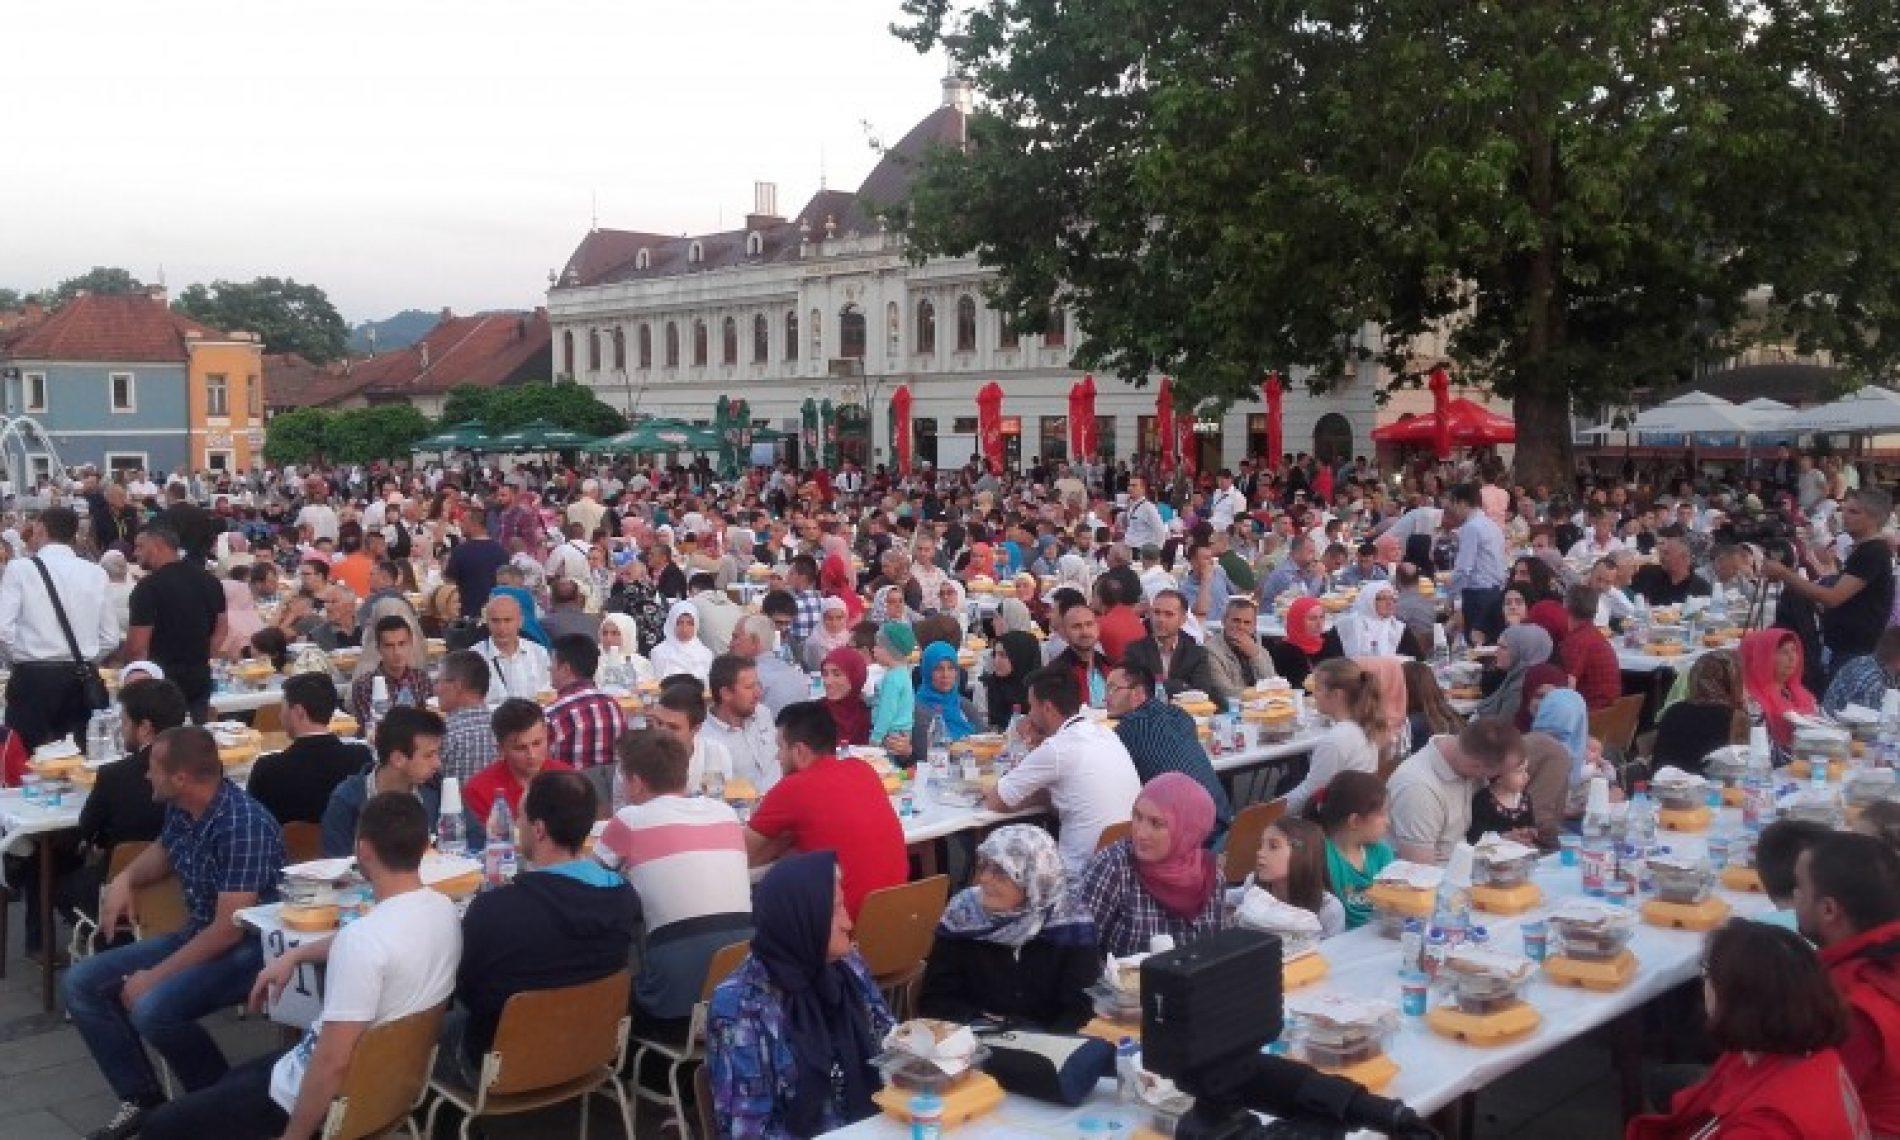 Na Trgu slobode u Tuzli iftarilo 2000 osoba (FOTO)